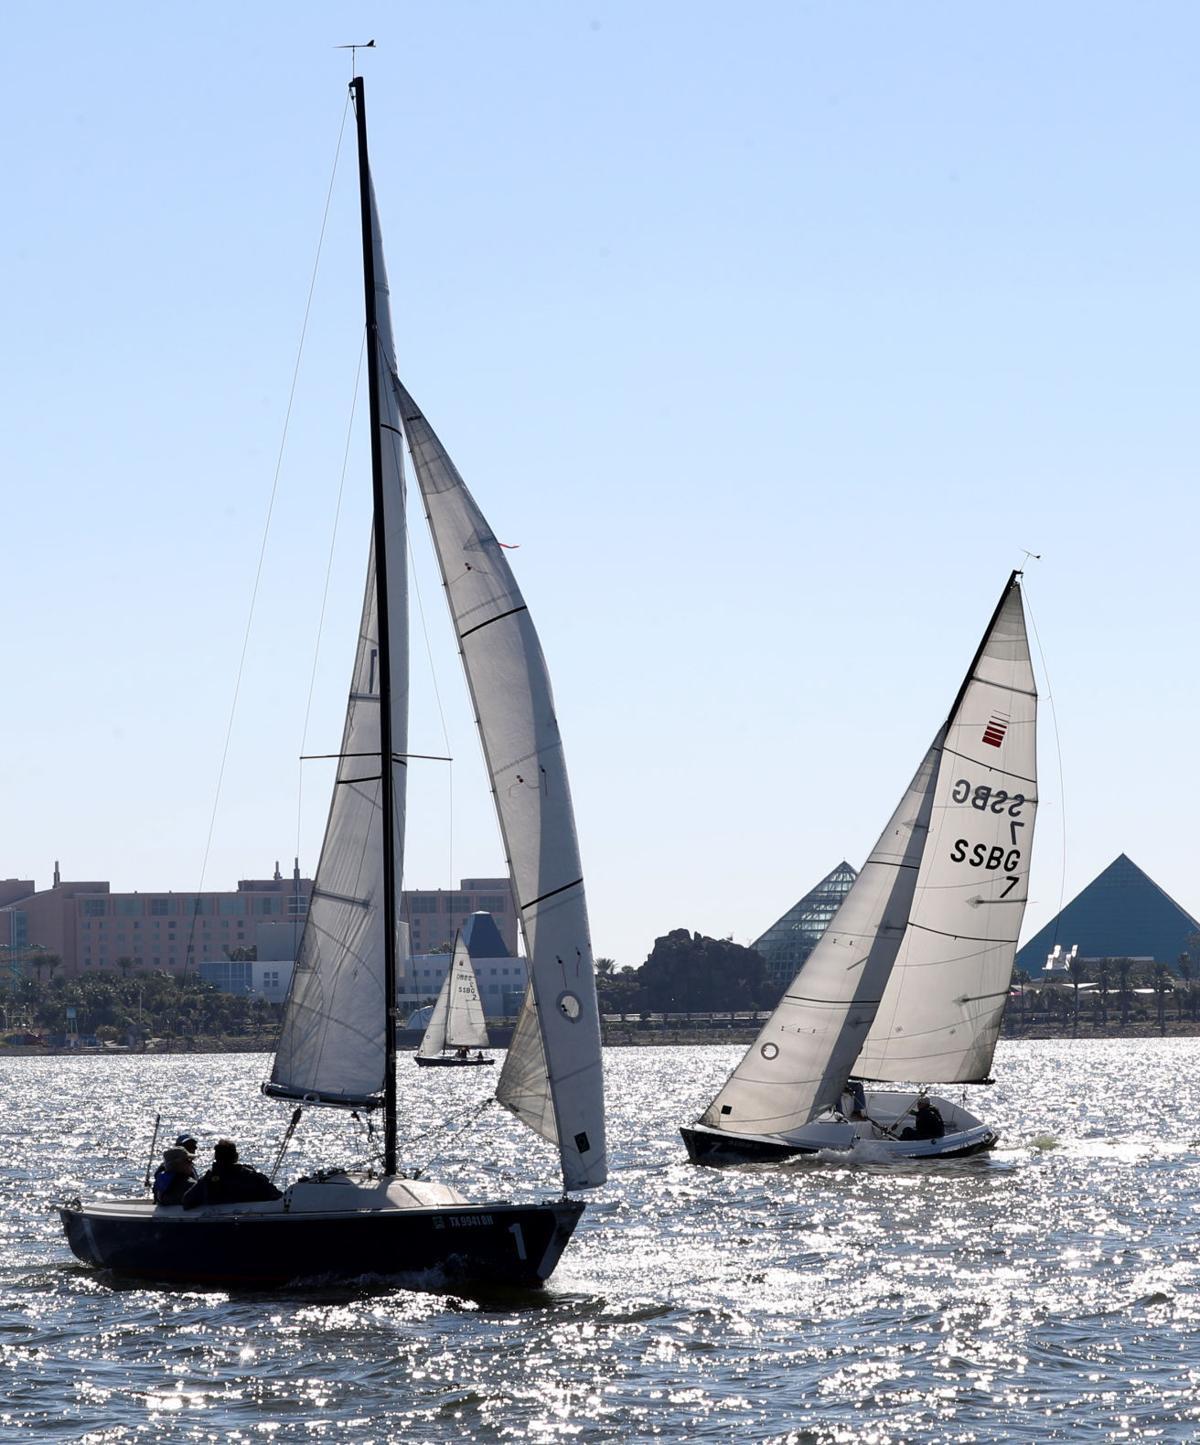 Sea Star Base Sailing races